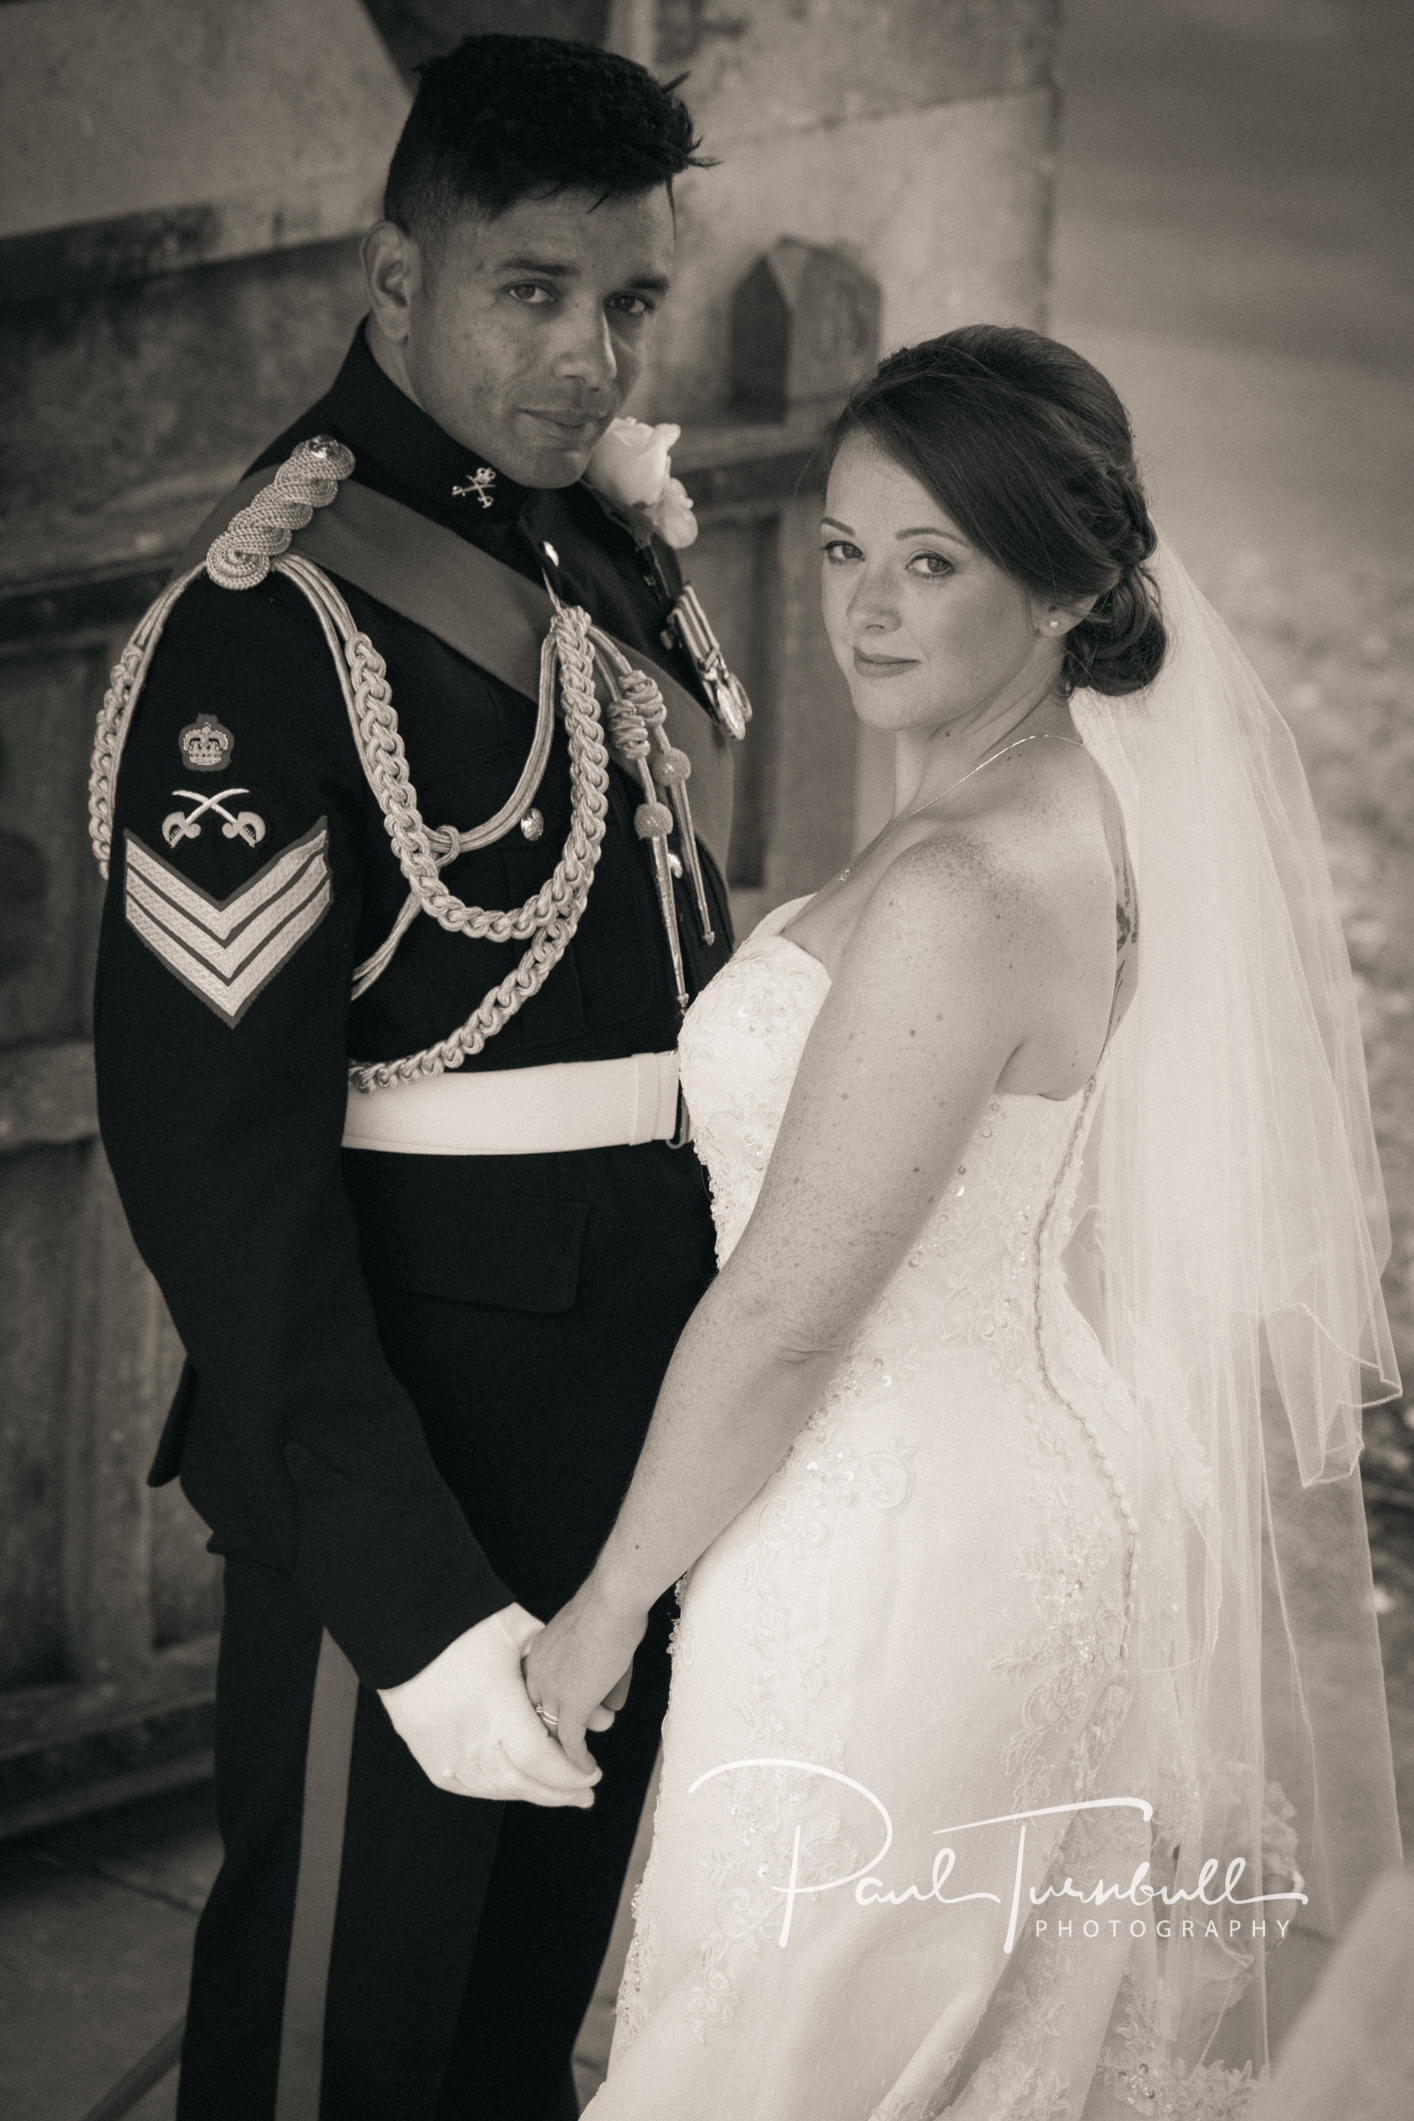 wedding-photographer-south-dalton-walkington-yorkshire-emma-james-049.jpg